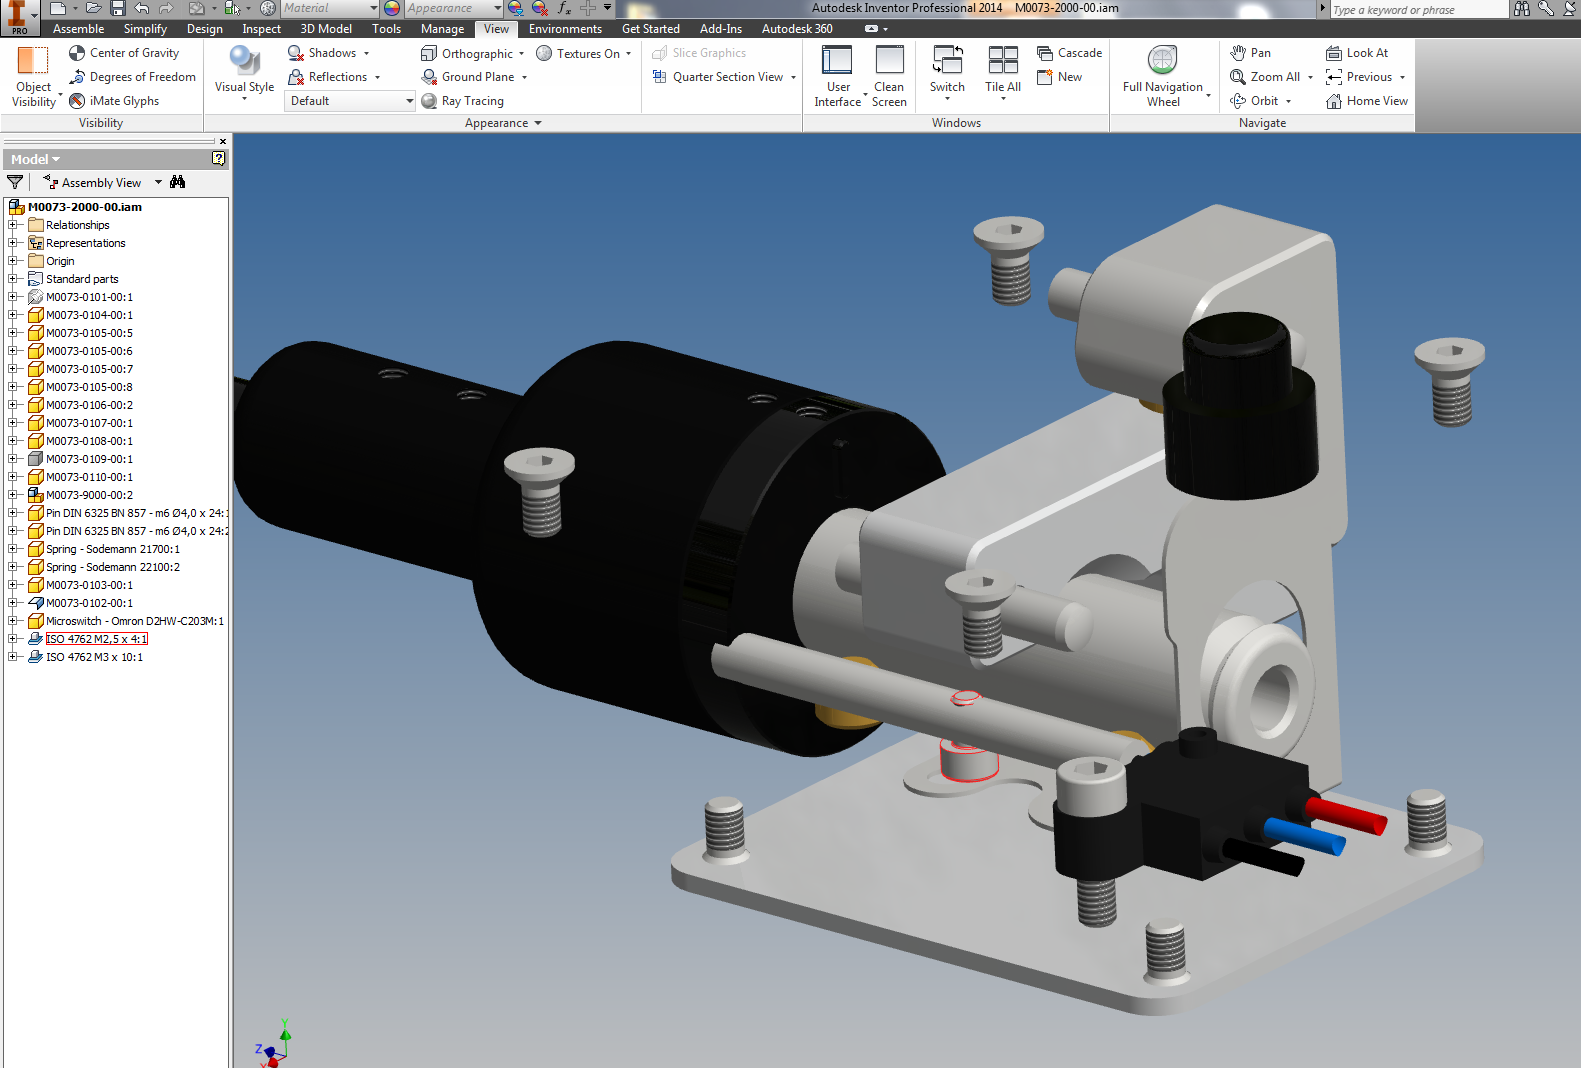 Inventor 2014 raytrace too dark - Autodesk Community